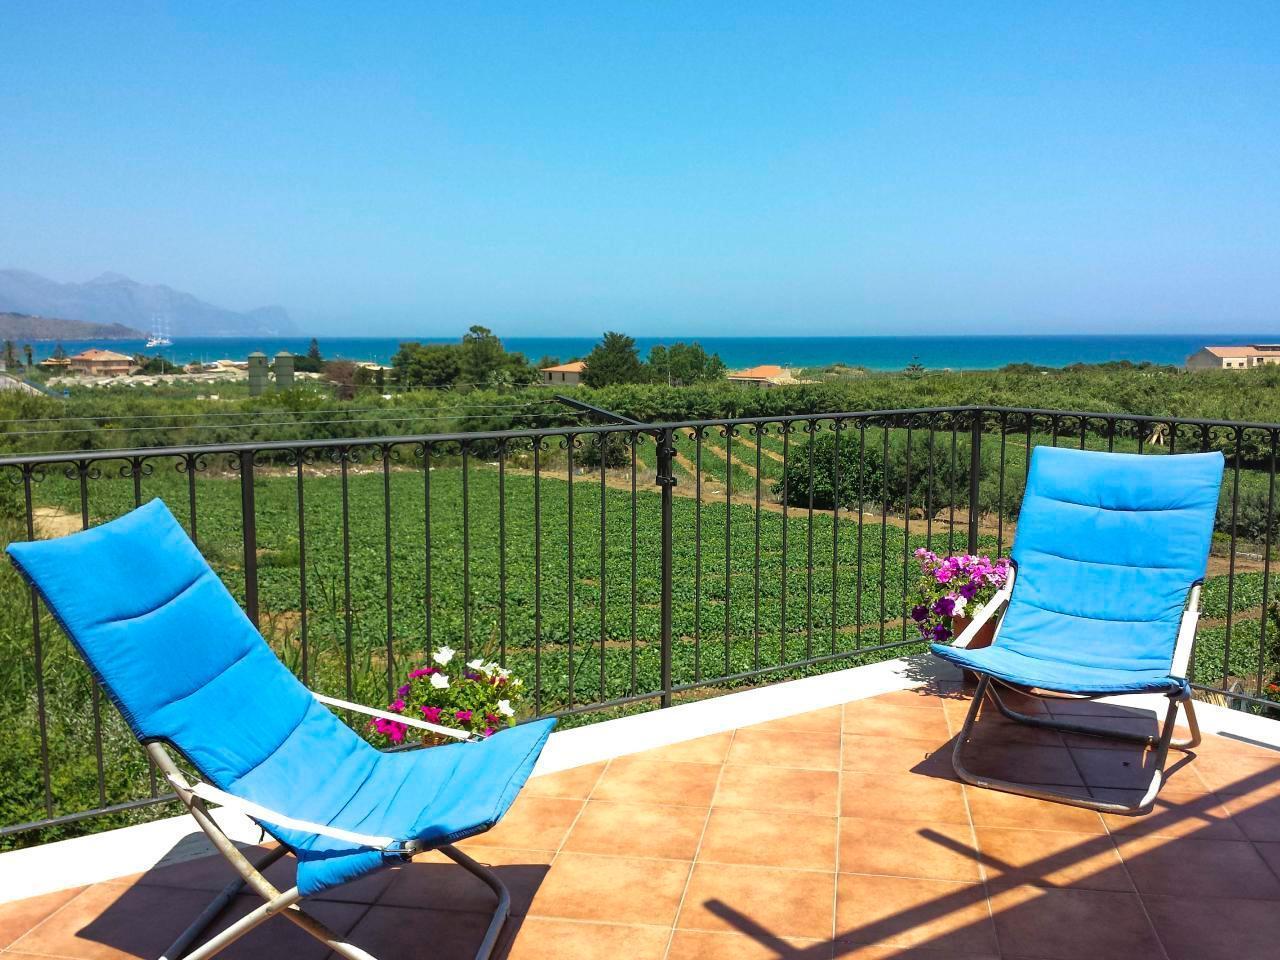 Maison de vacances Terraza Bella Vista - Garten - Wifi - 1 km vom Meer (1702639), Castellammare del Golfo, Trapani, Sicile, Italie, image 2